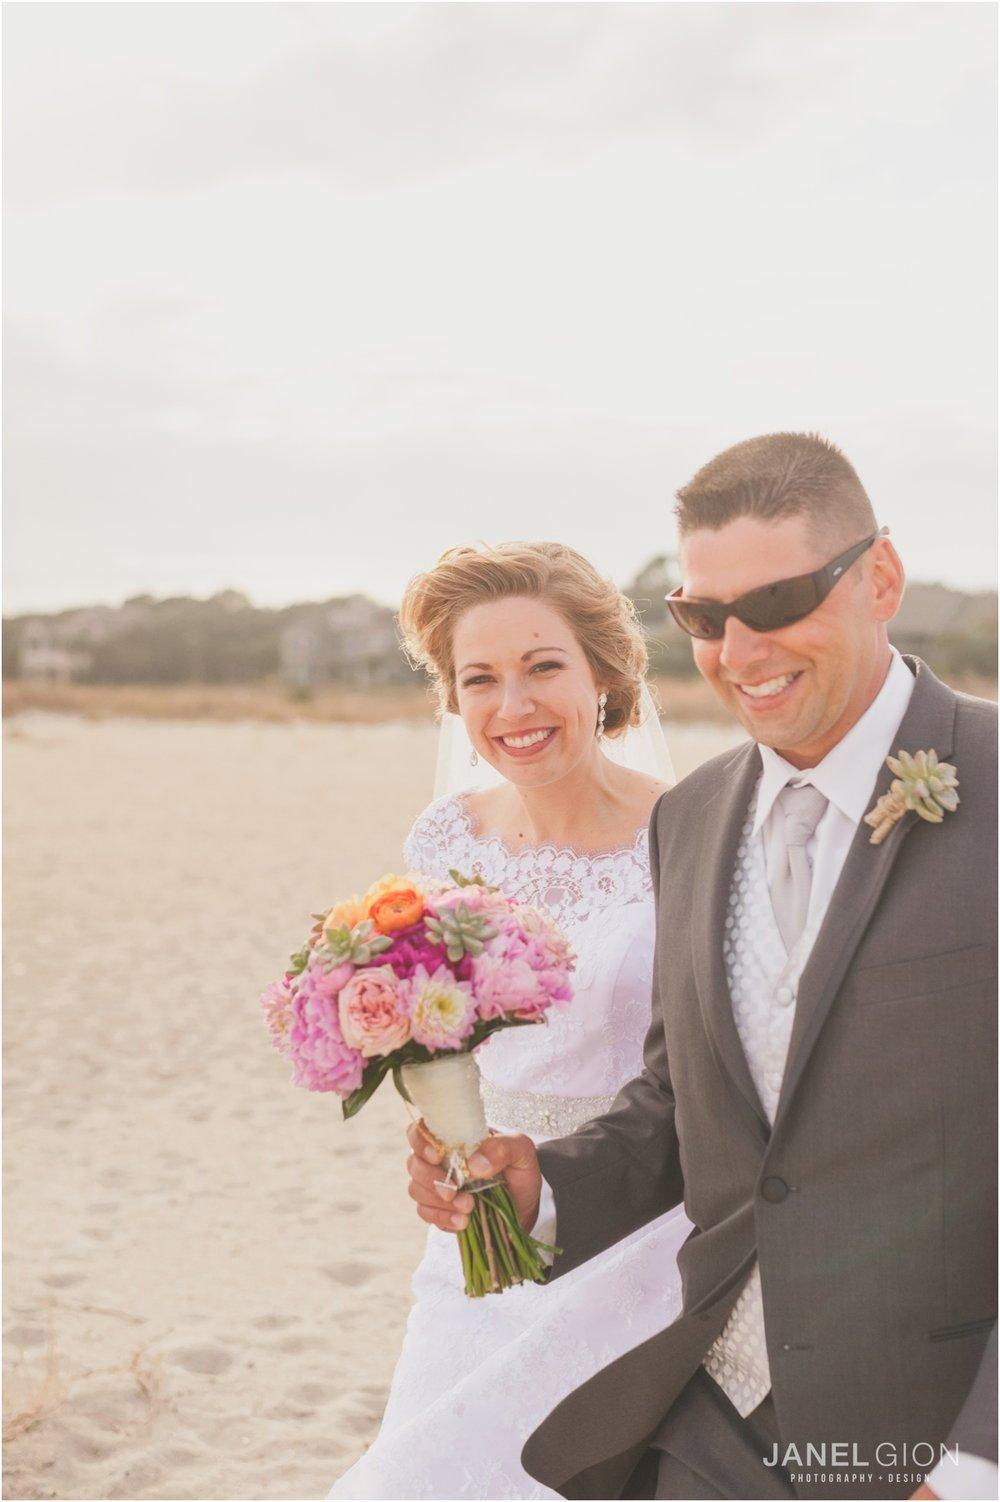 Janel-Gion-Hilton-Head-Island-SC-Destination-Wedding-Photographer_0018